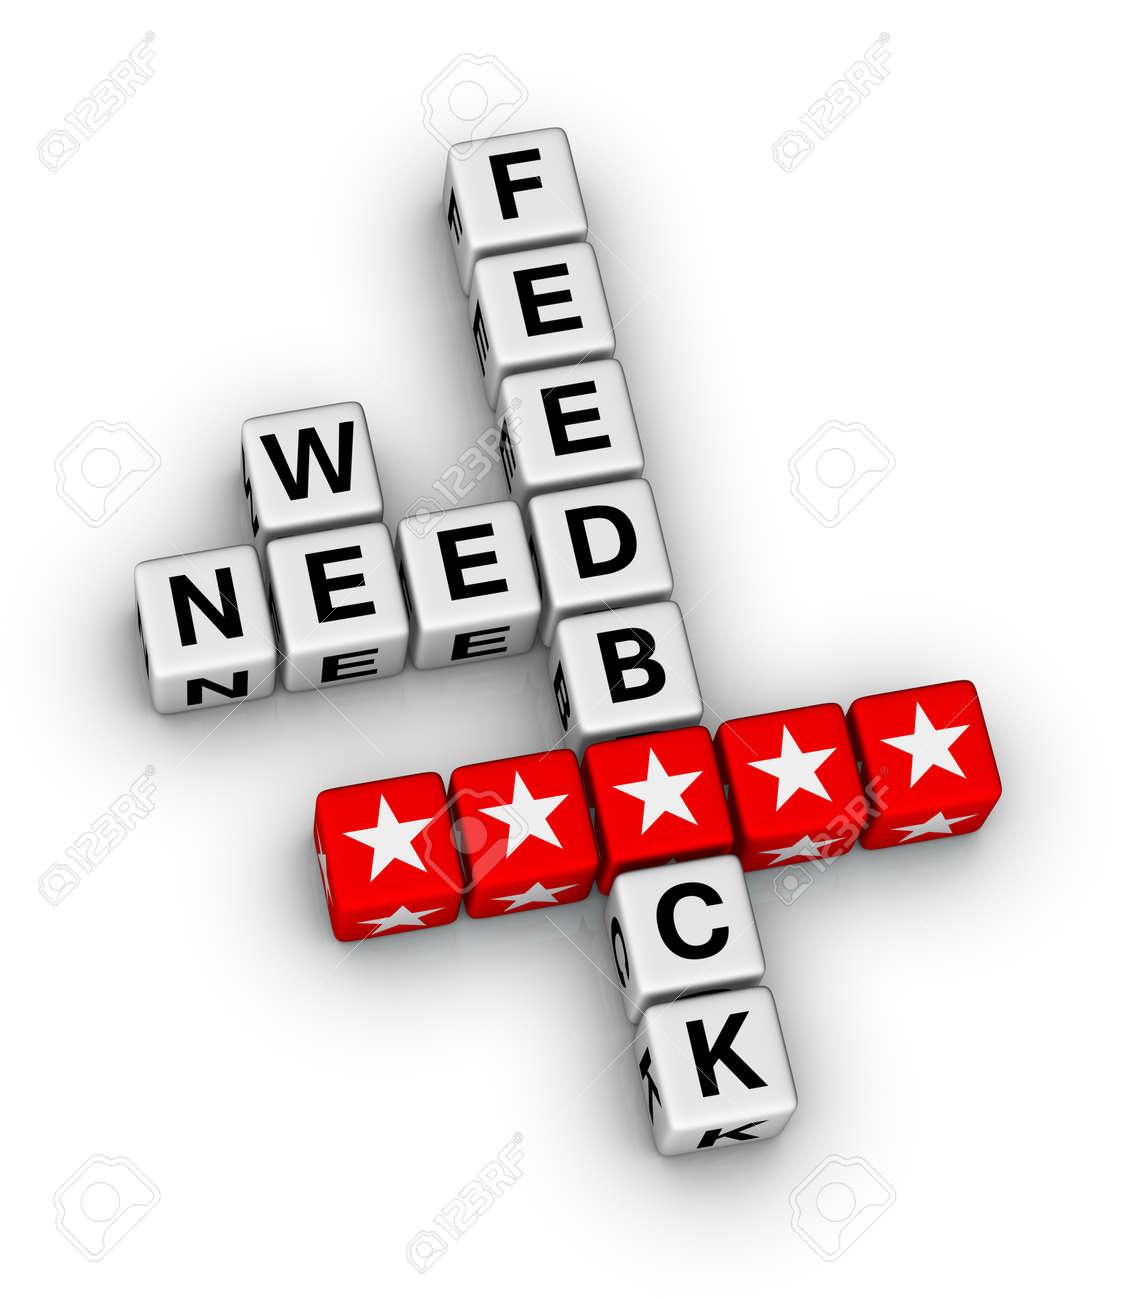 we want feedback crossword puzzle Stock Photo - 27708588